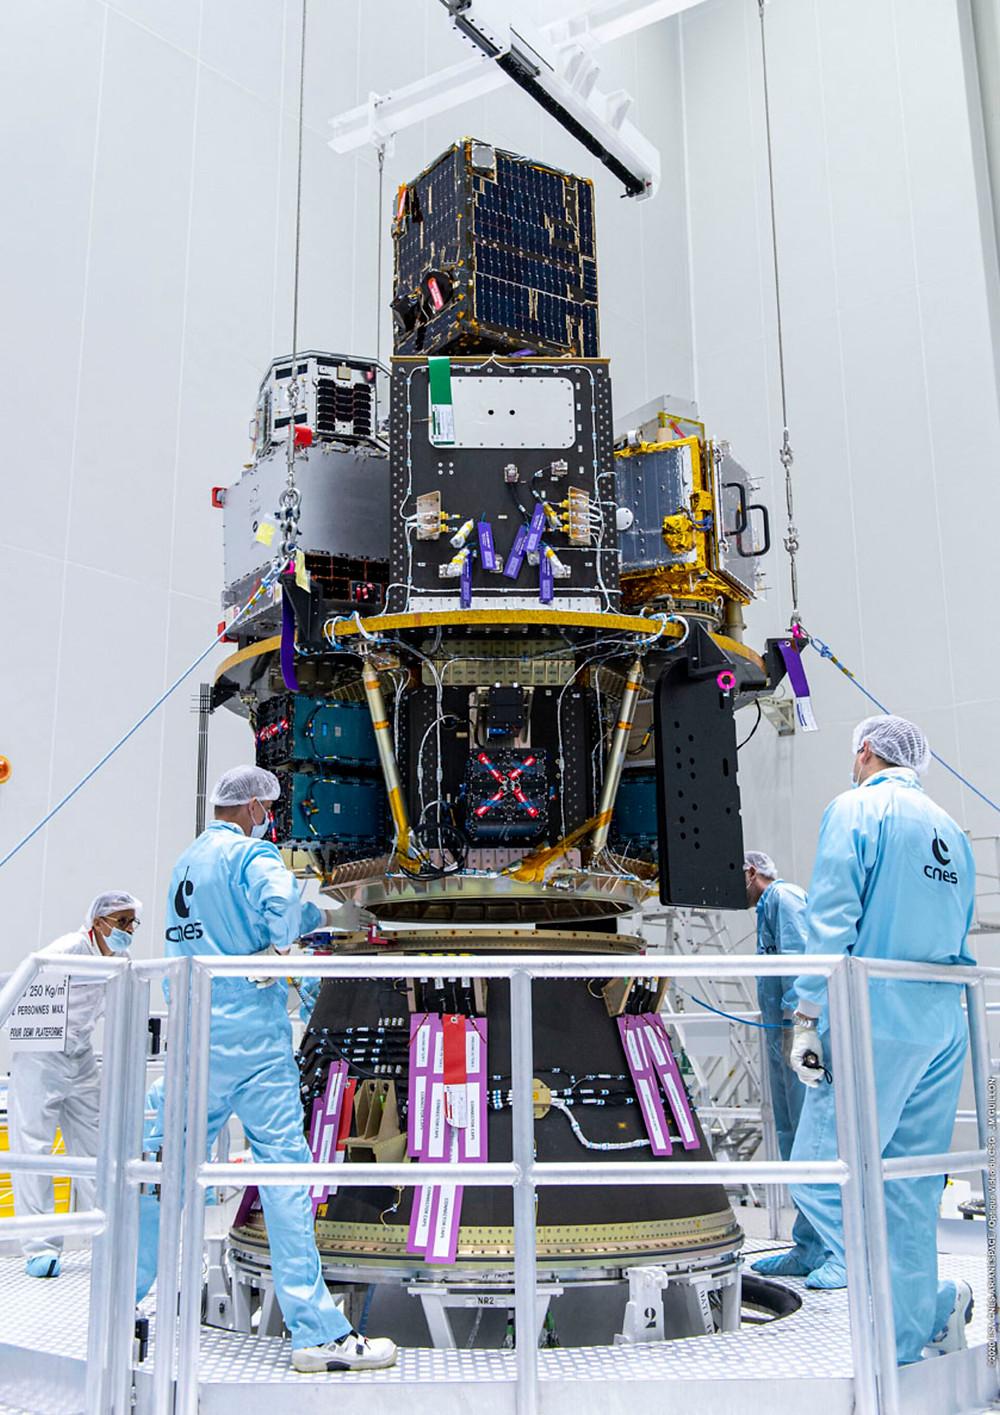 The ESAIL satellite prior to encapsulation